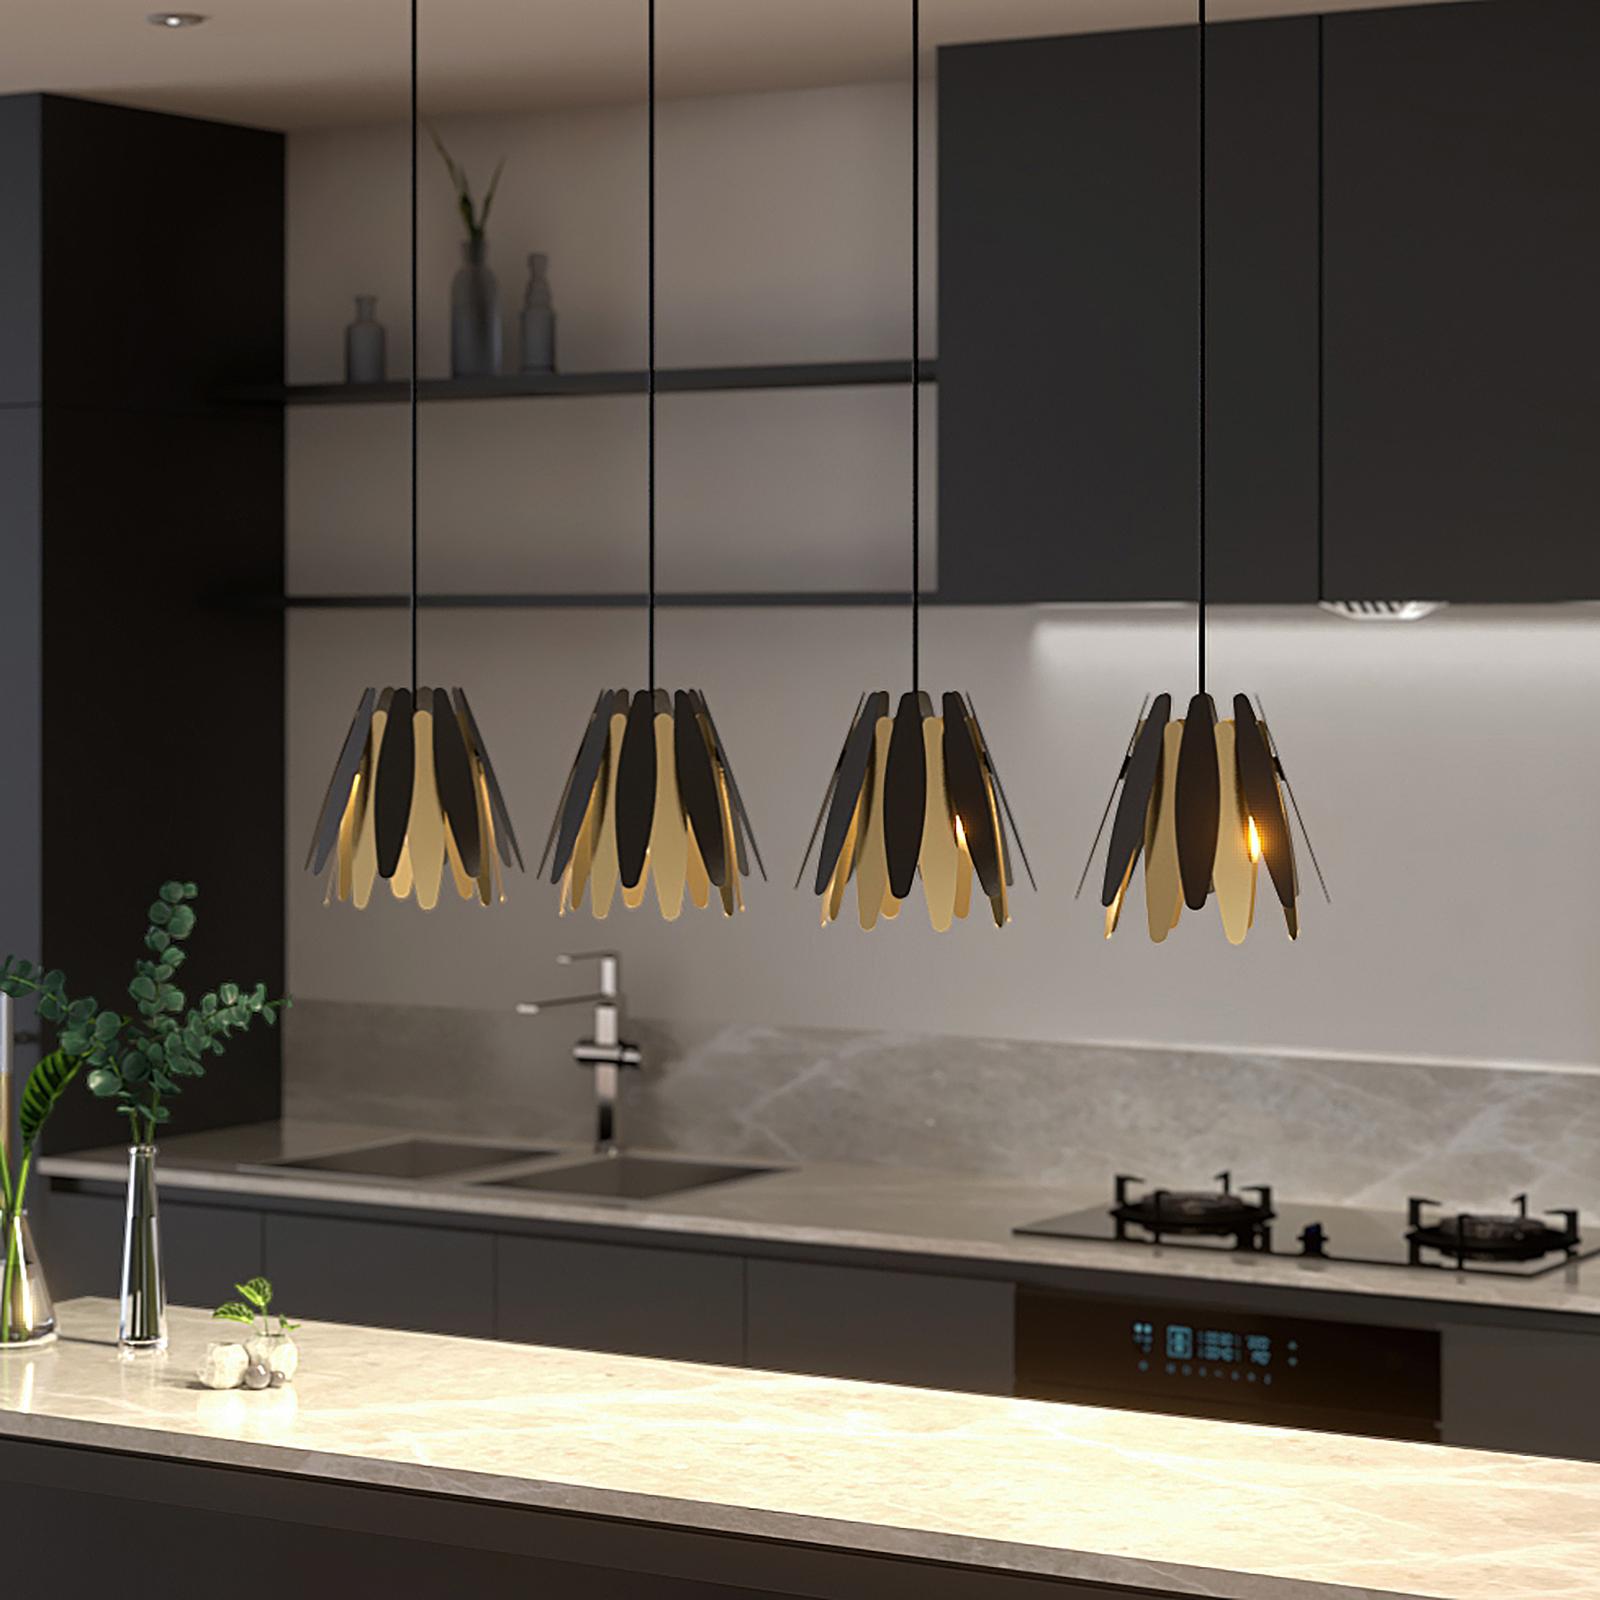 Lucande Lounit hänglampa, svart-guld, 4 lampor